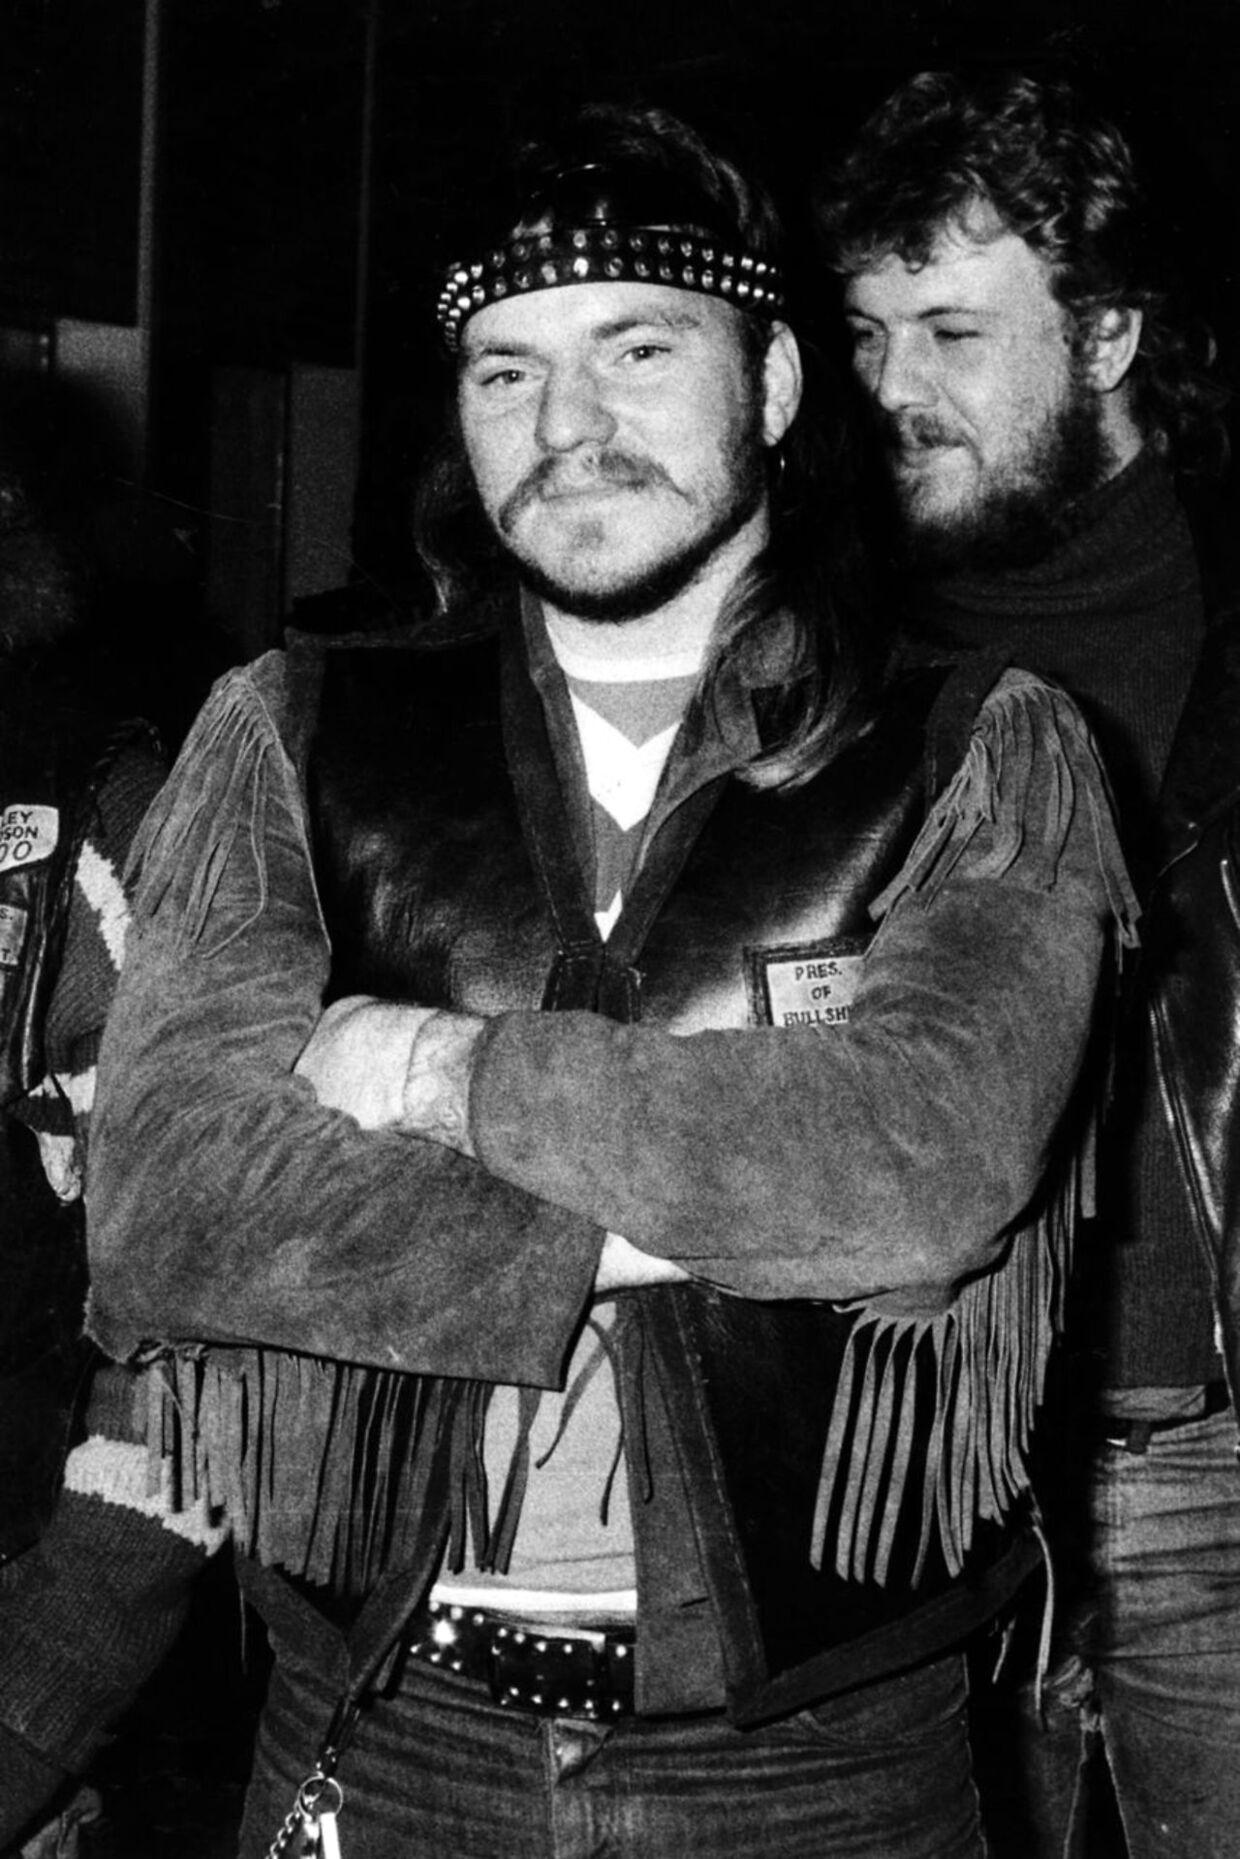 Bullshits leder 'Makrellen' alias Henning Norbert Knudsen i 1984. Han bliver likvideret samme år af HA-rockeren Jønke.